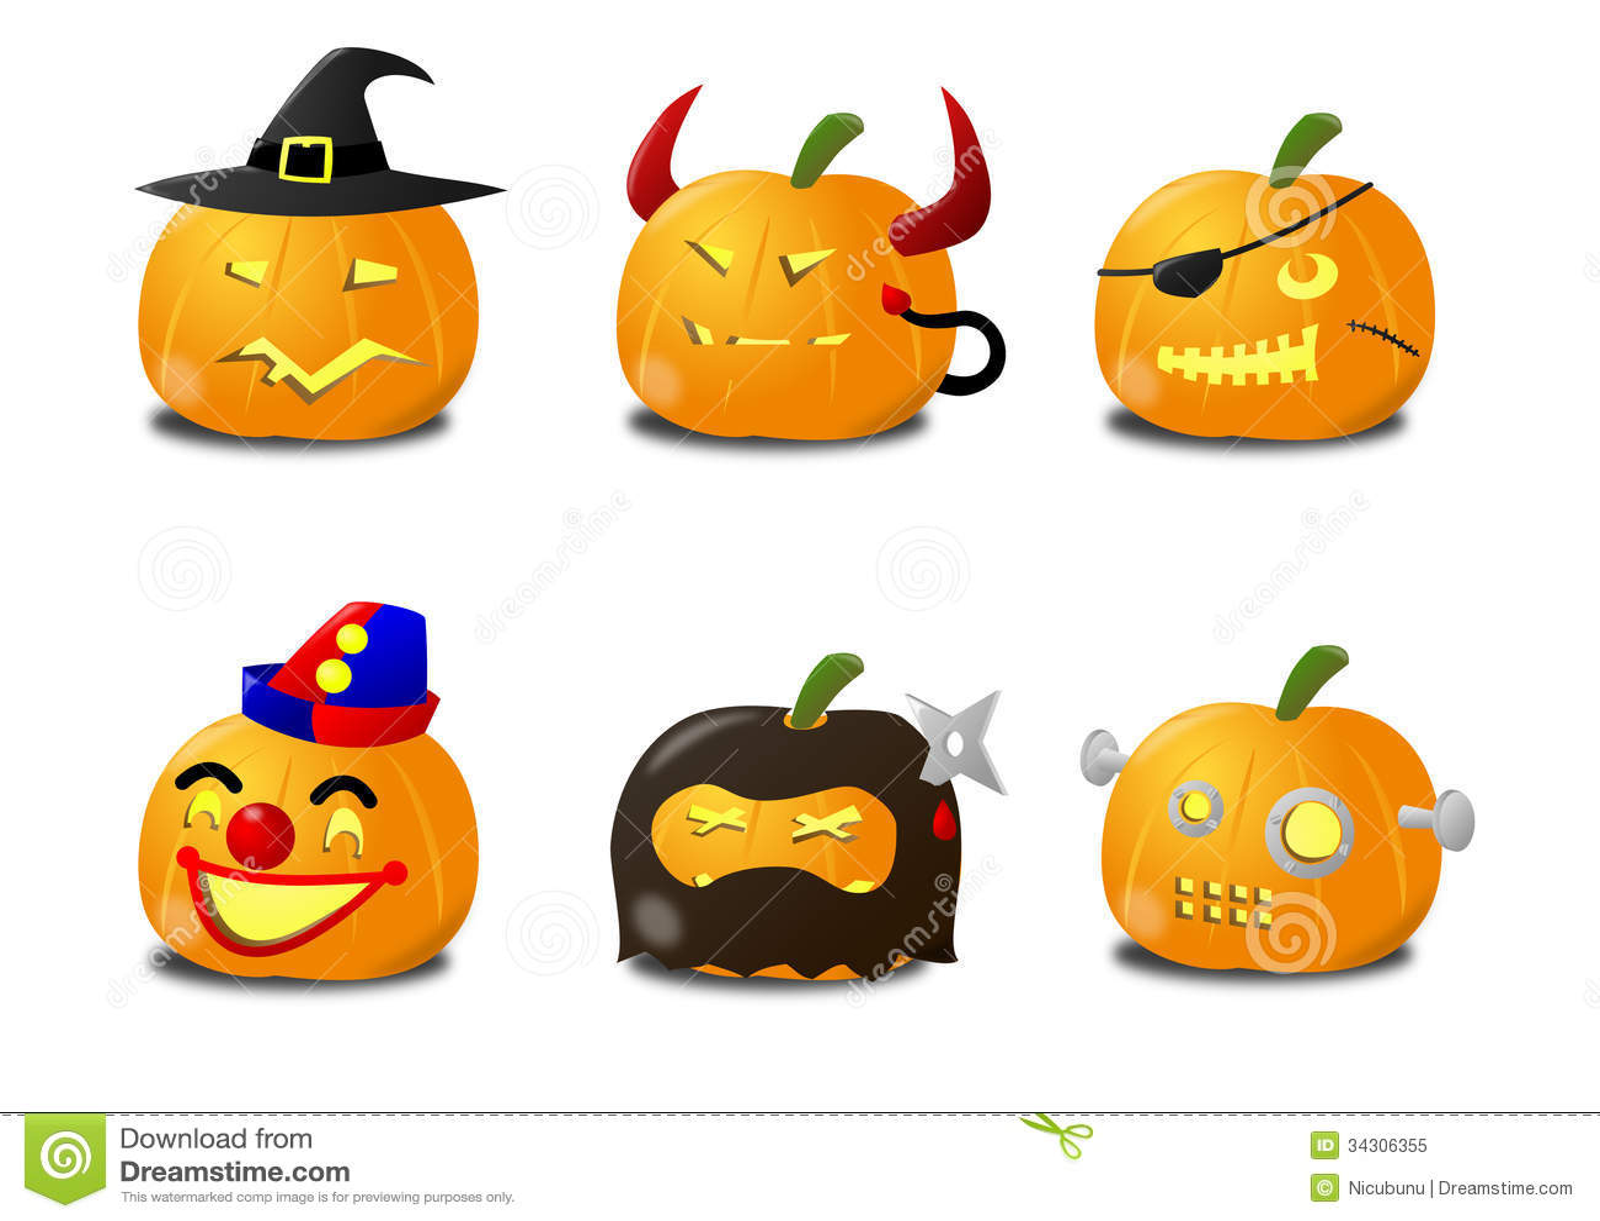 Ninja Smiley Face Icons Cartoon Vector